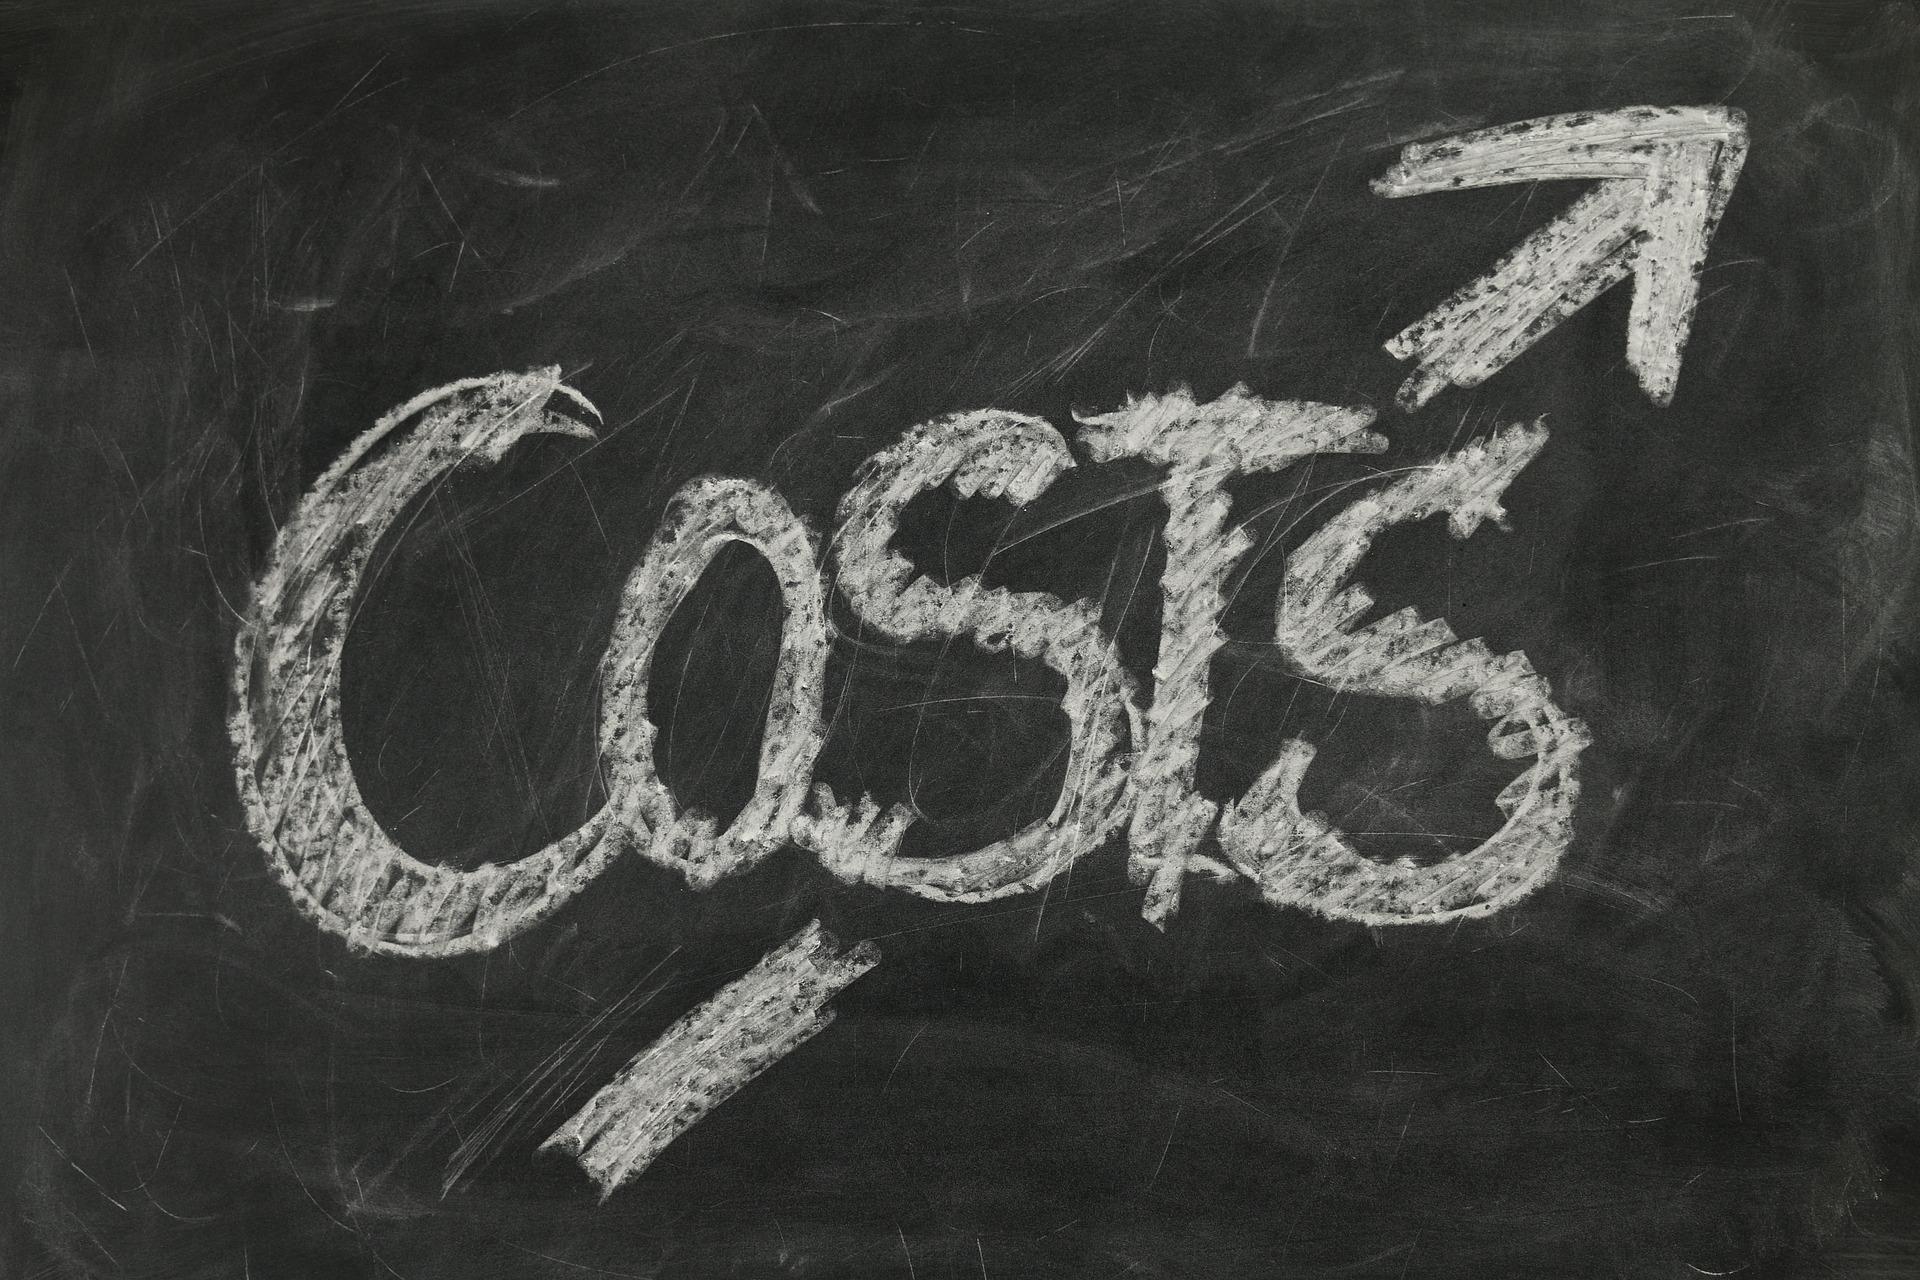 Cover zu Berunfunfähigkeitsversicherung wird teurer